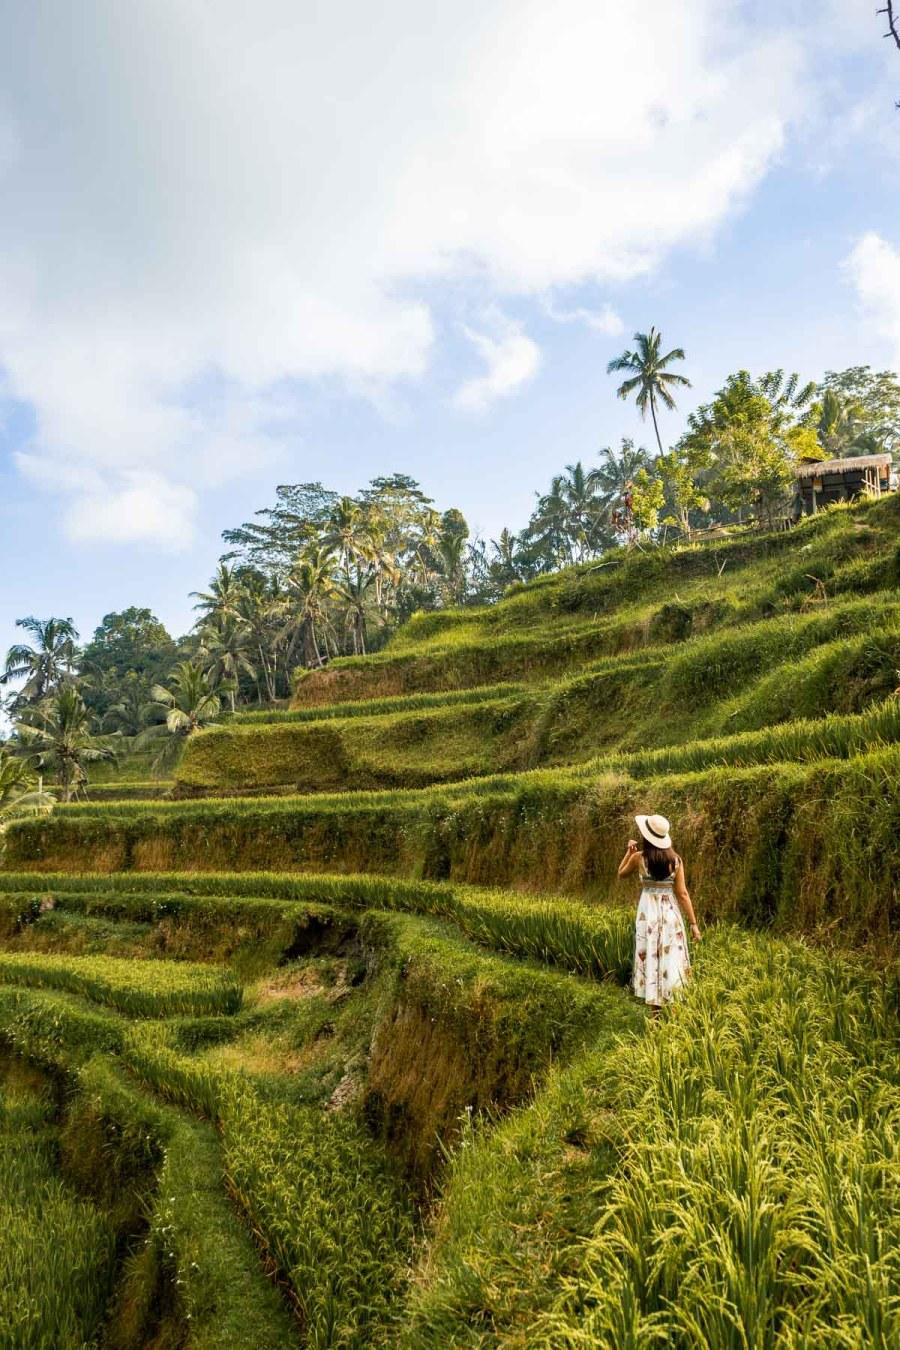 Girl standing among the lush green rice paddies at Tegallalang Rice Terraces in Bali